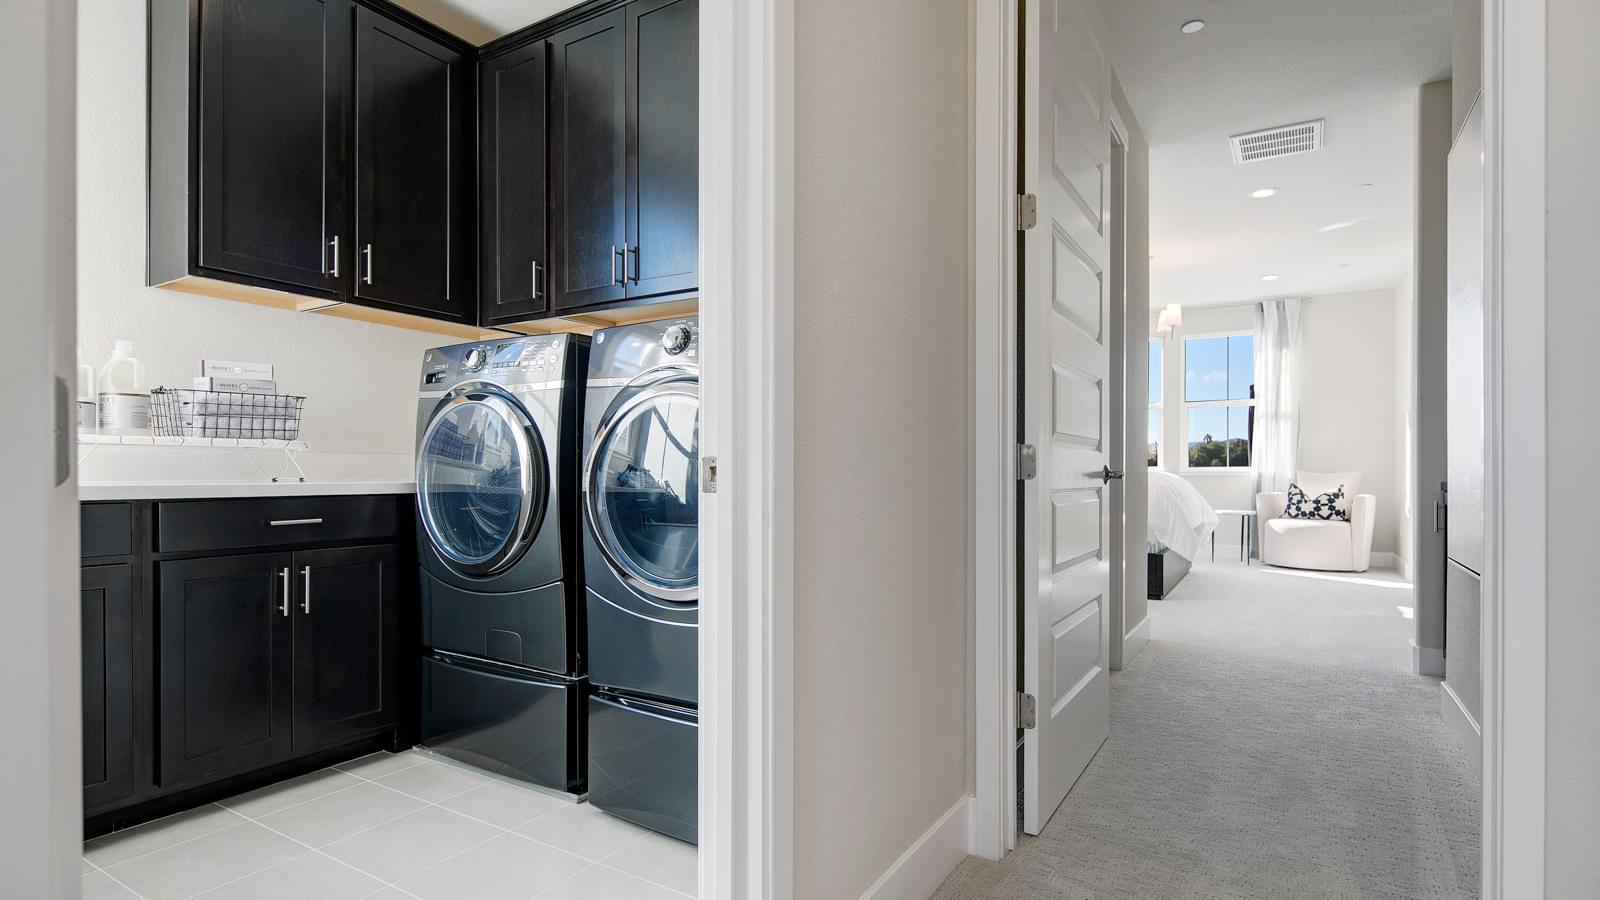 Residence 1 Laundry & Master Bedroom